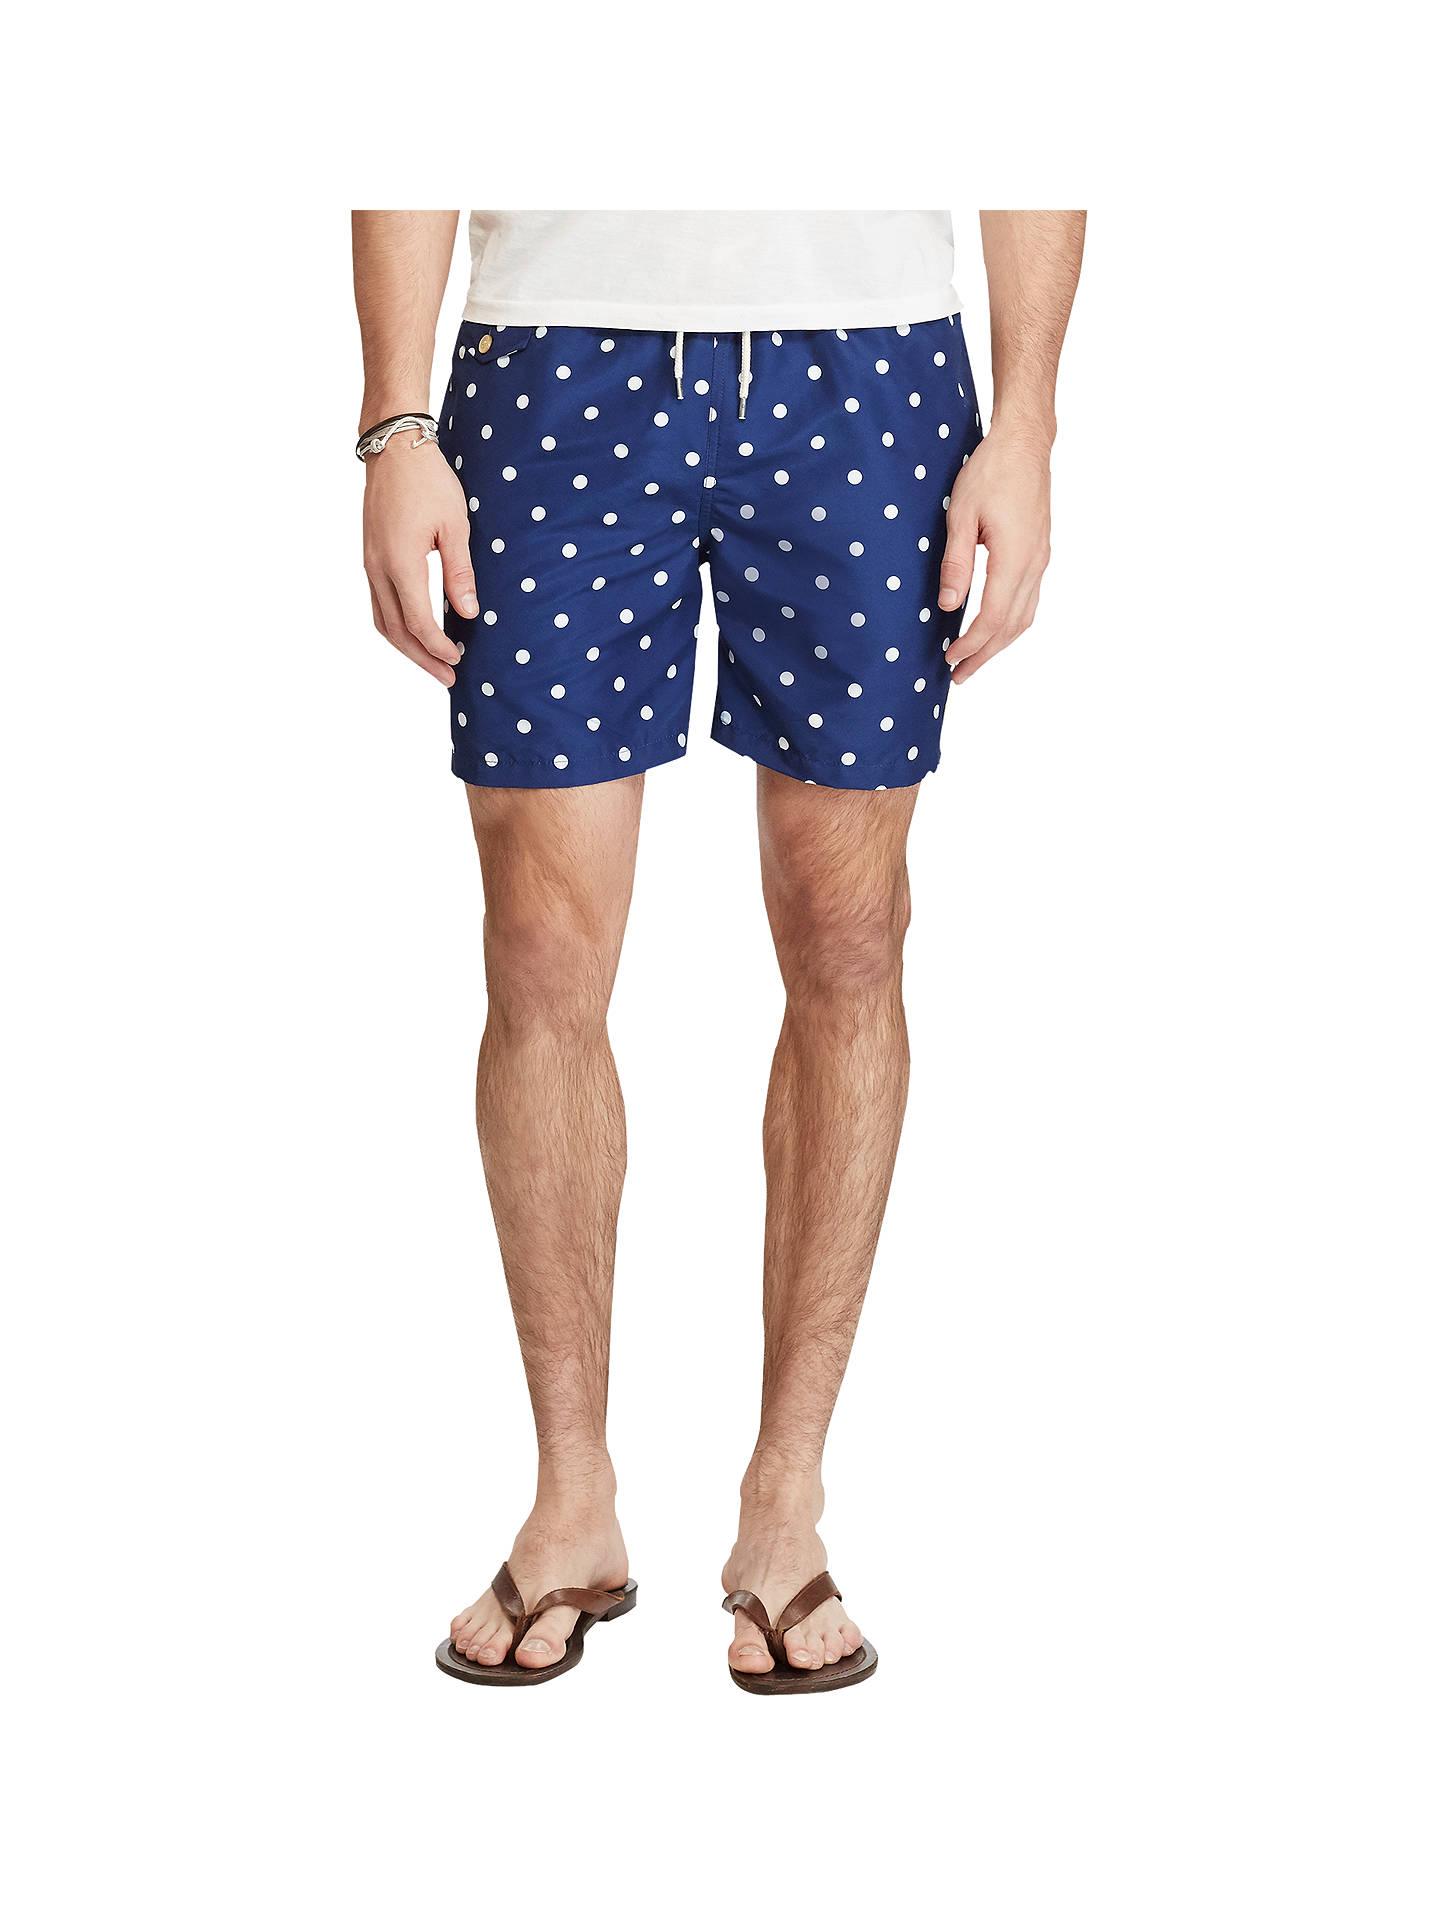 90a053fe47 Buy Polo Ralph Lauren Polka Dot Swim Shorts, Blue, M Online at johnlewis.